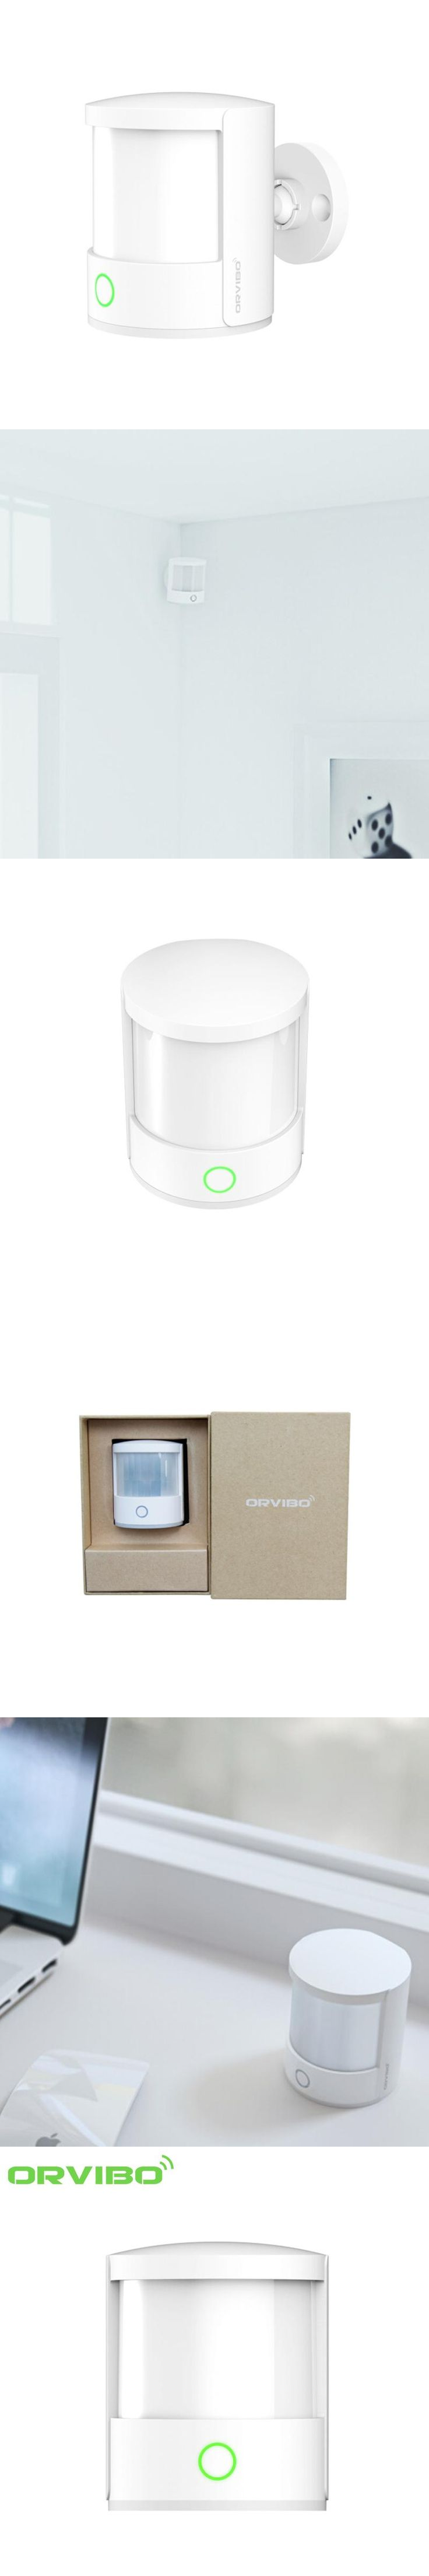 Orvibo ZigBee Smart Home Motion Sensor Smart Home Intelligent Automation Human Pet Movement Sensor Alarm Detector Night Light